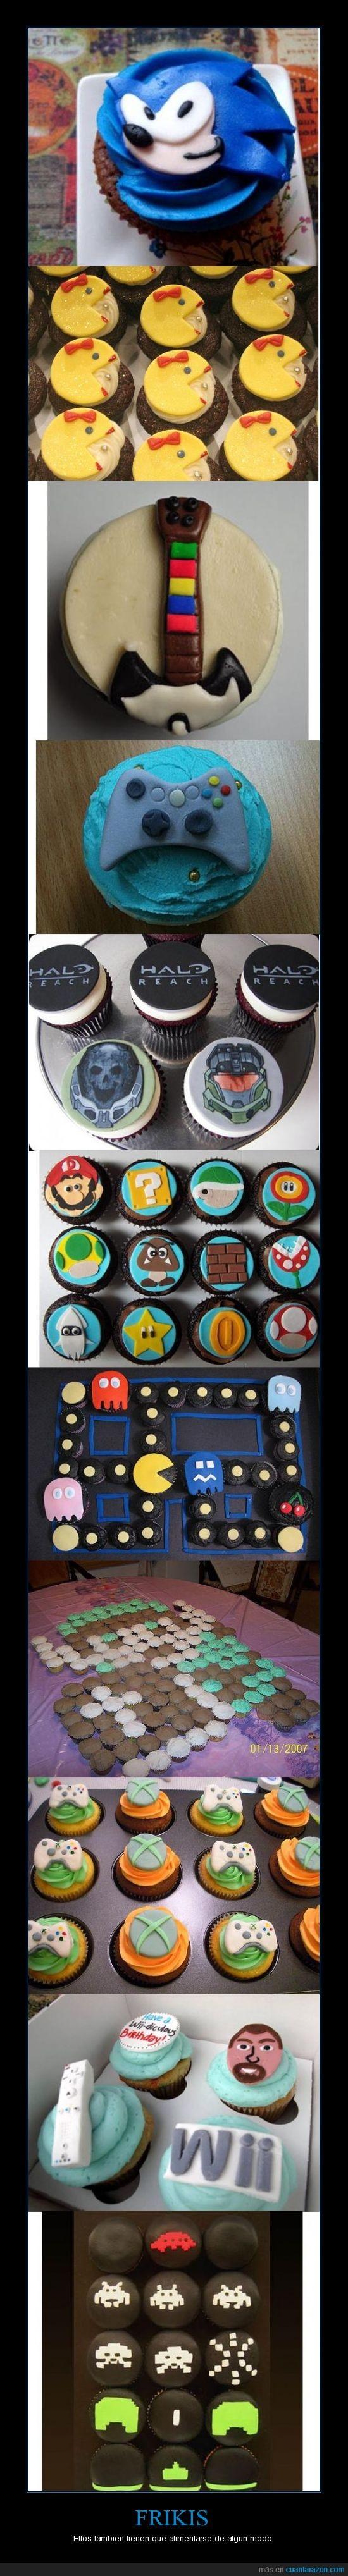 cupcakes,hambre,magdalenas,videojuegos